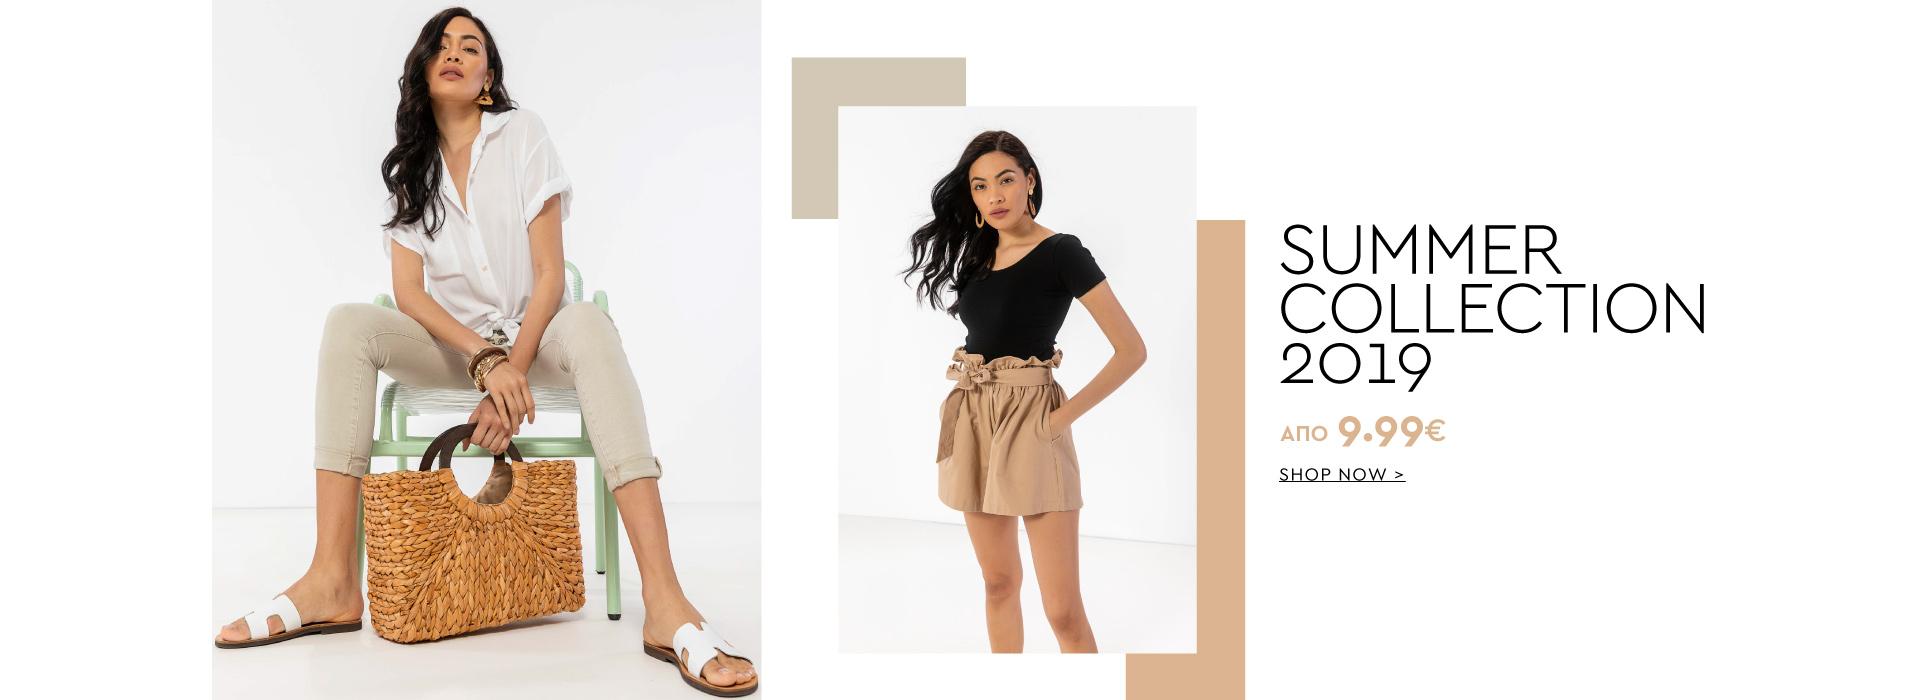 048bbfb049d8 Γυναικεία παπούτσια, γυναικεία ρούχα και αξεσουάρ - TheFashionProject